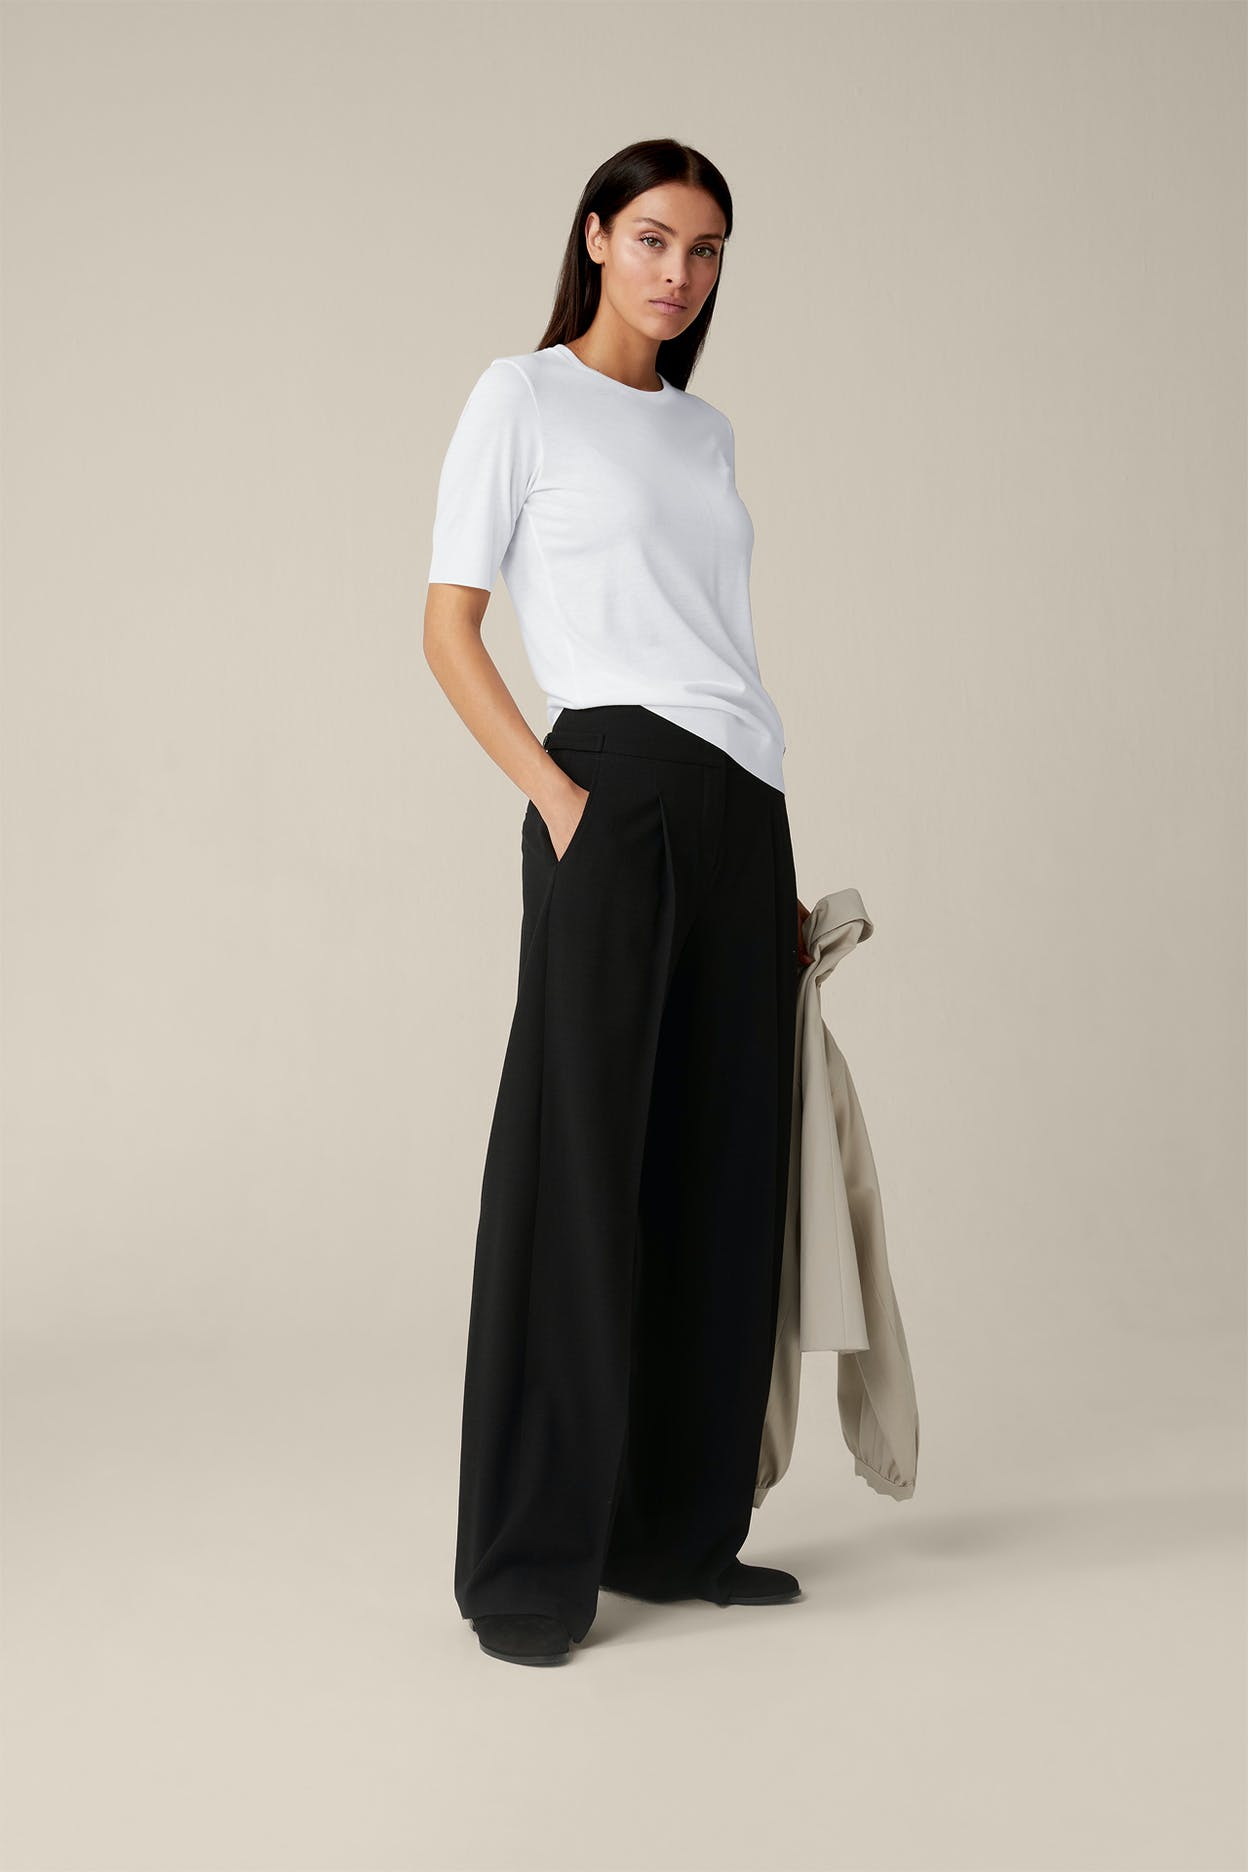 Tencel-Baumwoll-Shirt in Weiss